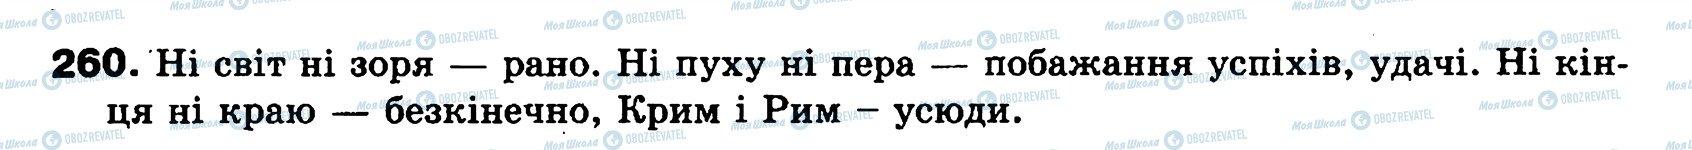 ГДЗ Укр мова 8 класс страница 260